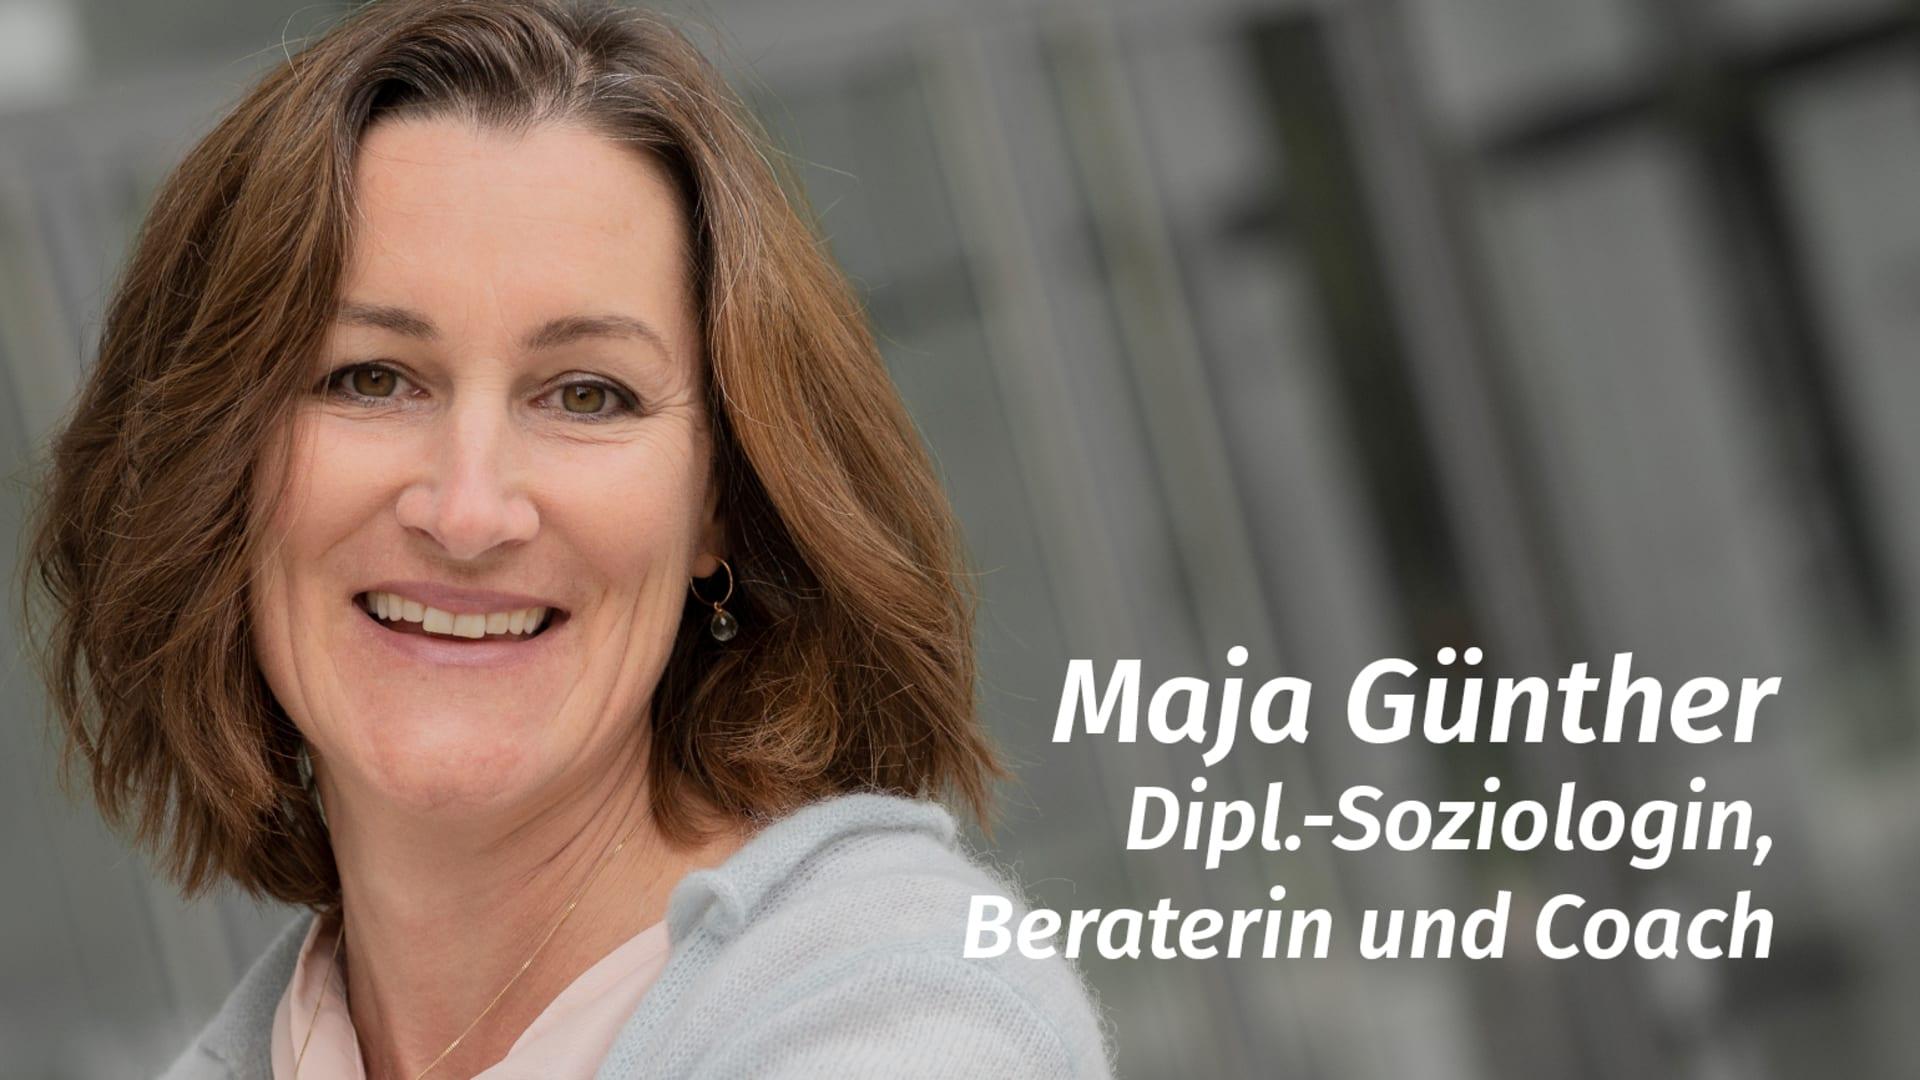 Maja Günther Autorenseite